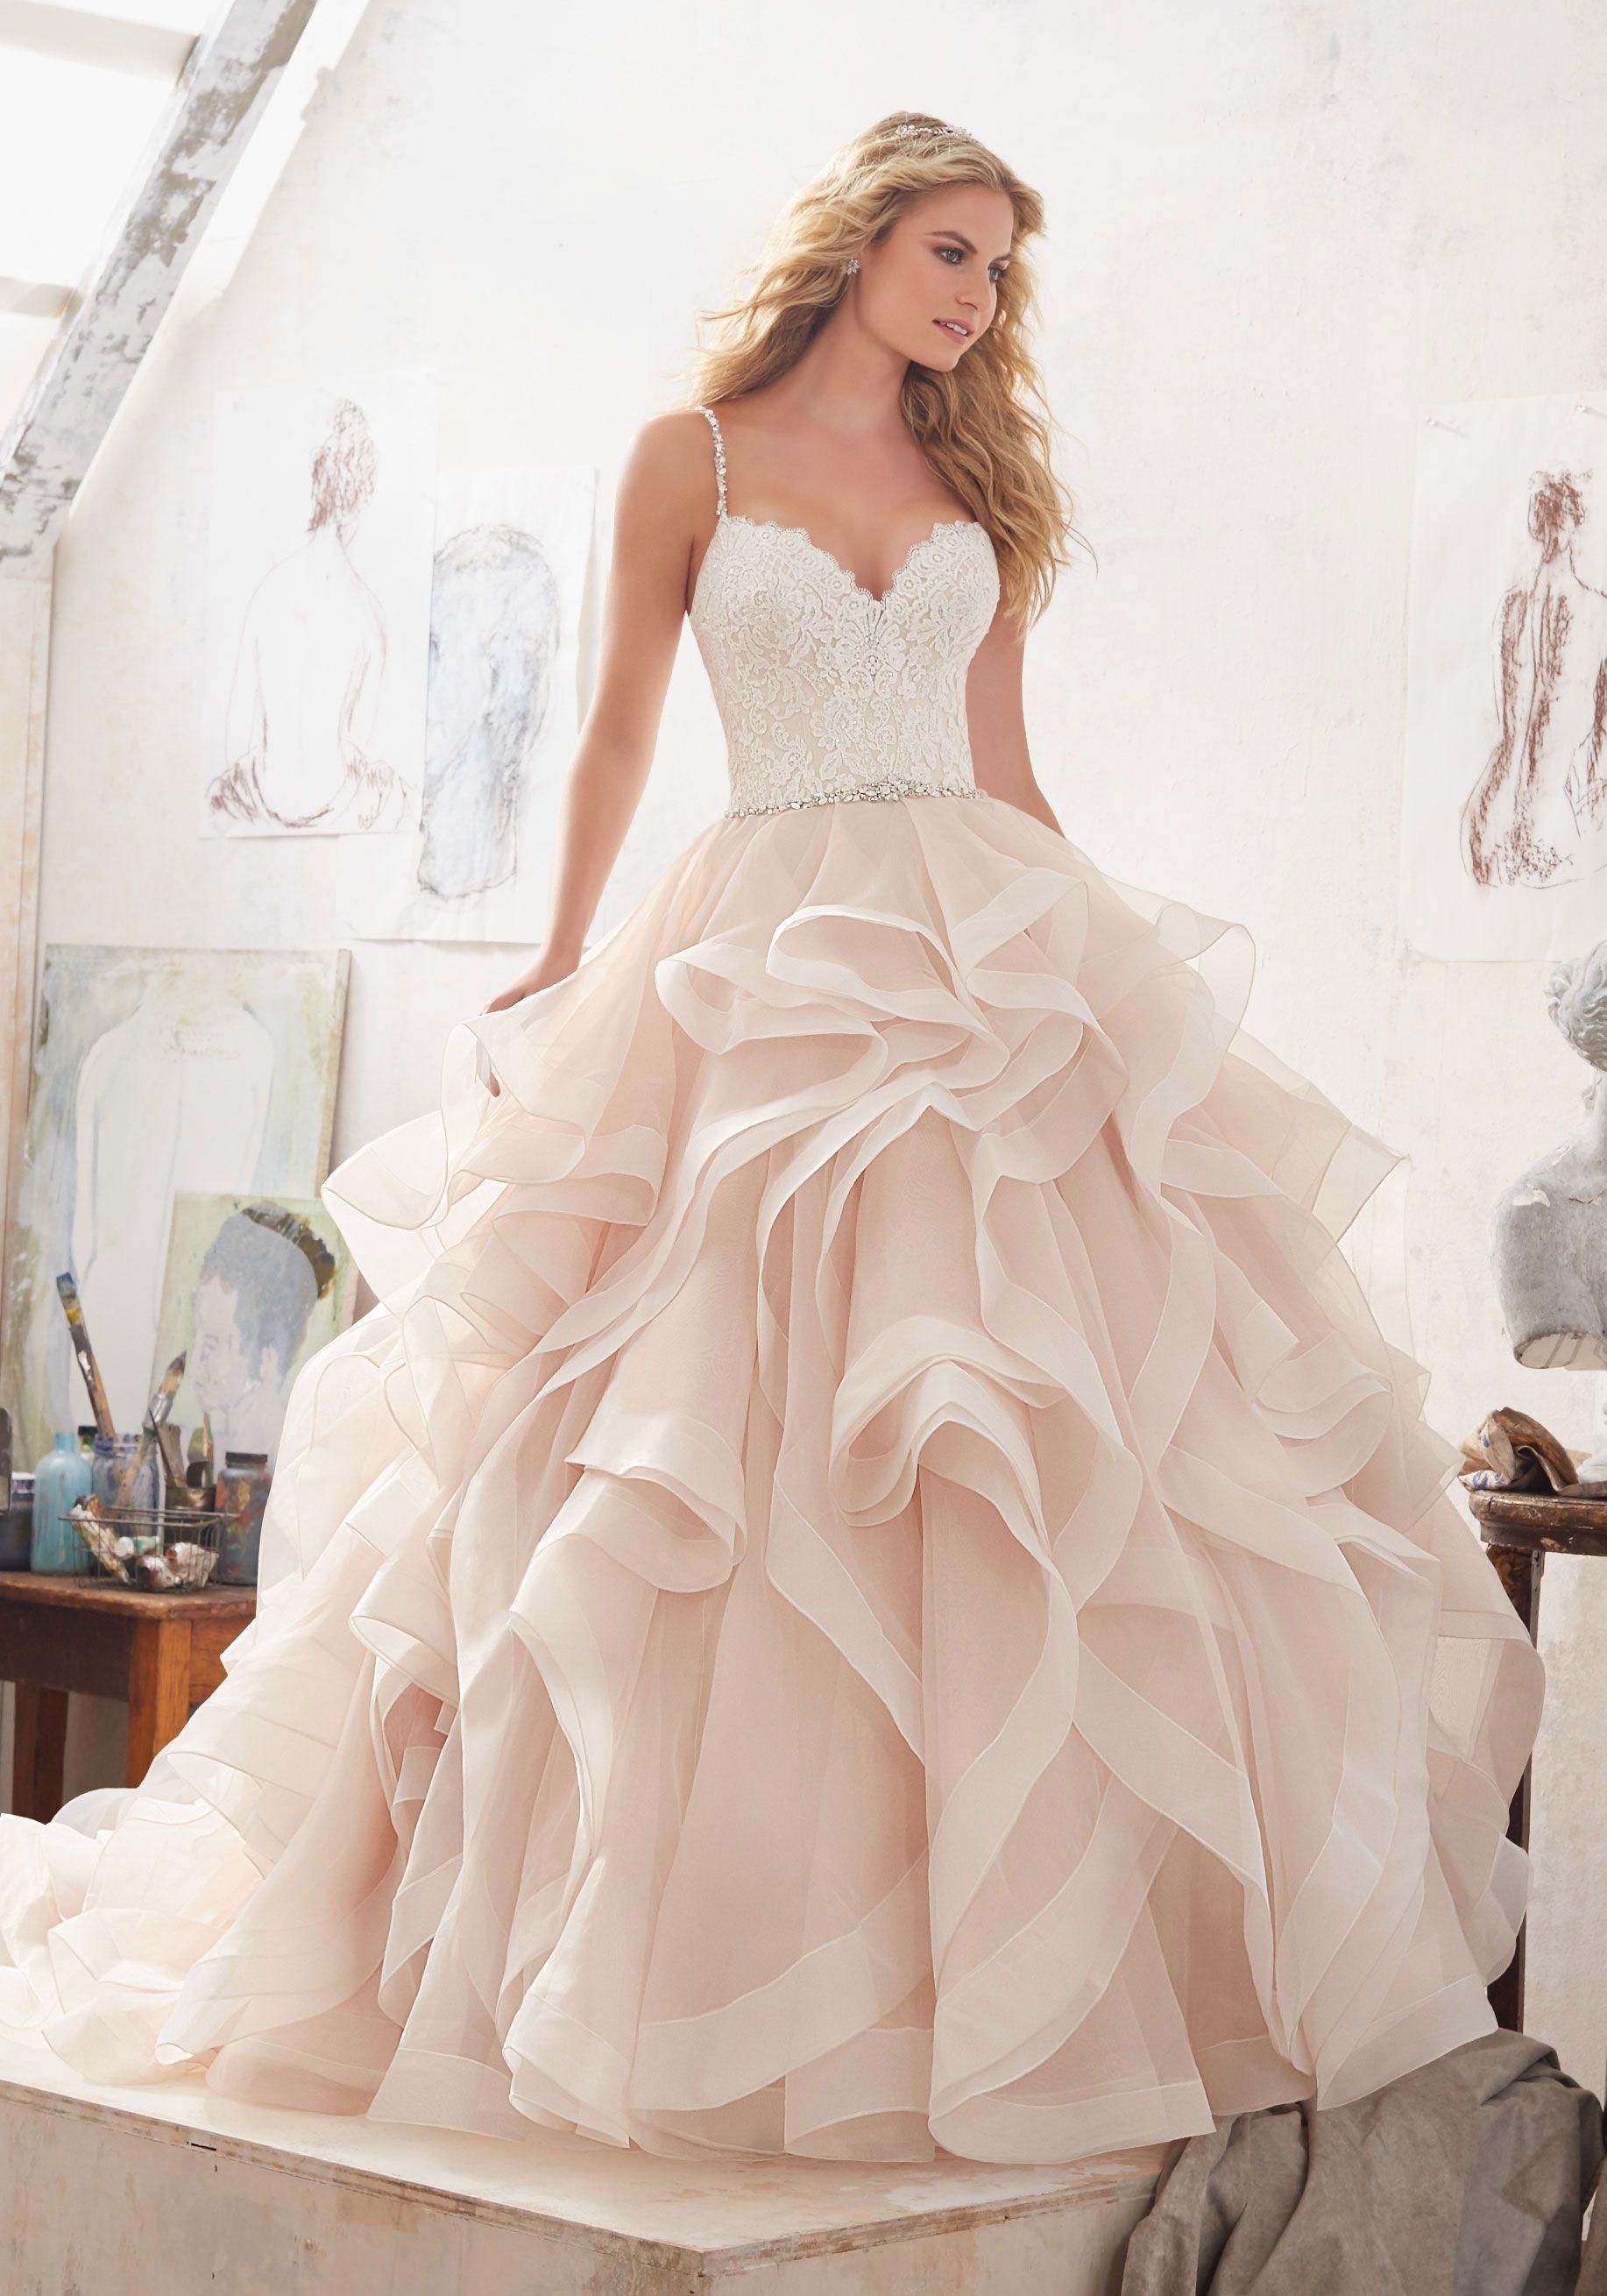 Design your own wedding dress for fun  Teesha Persad Teeshapersad on Pinterest